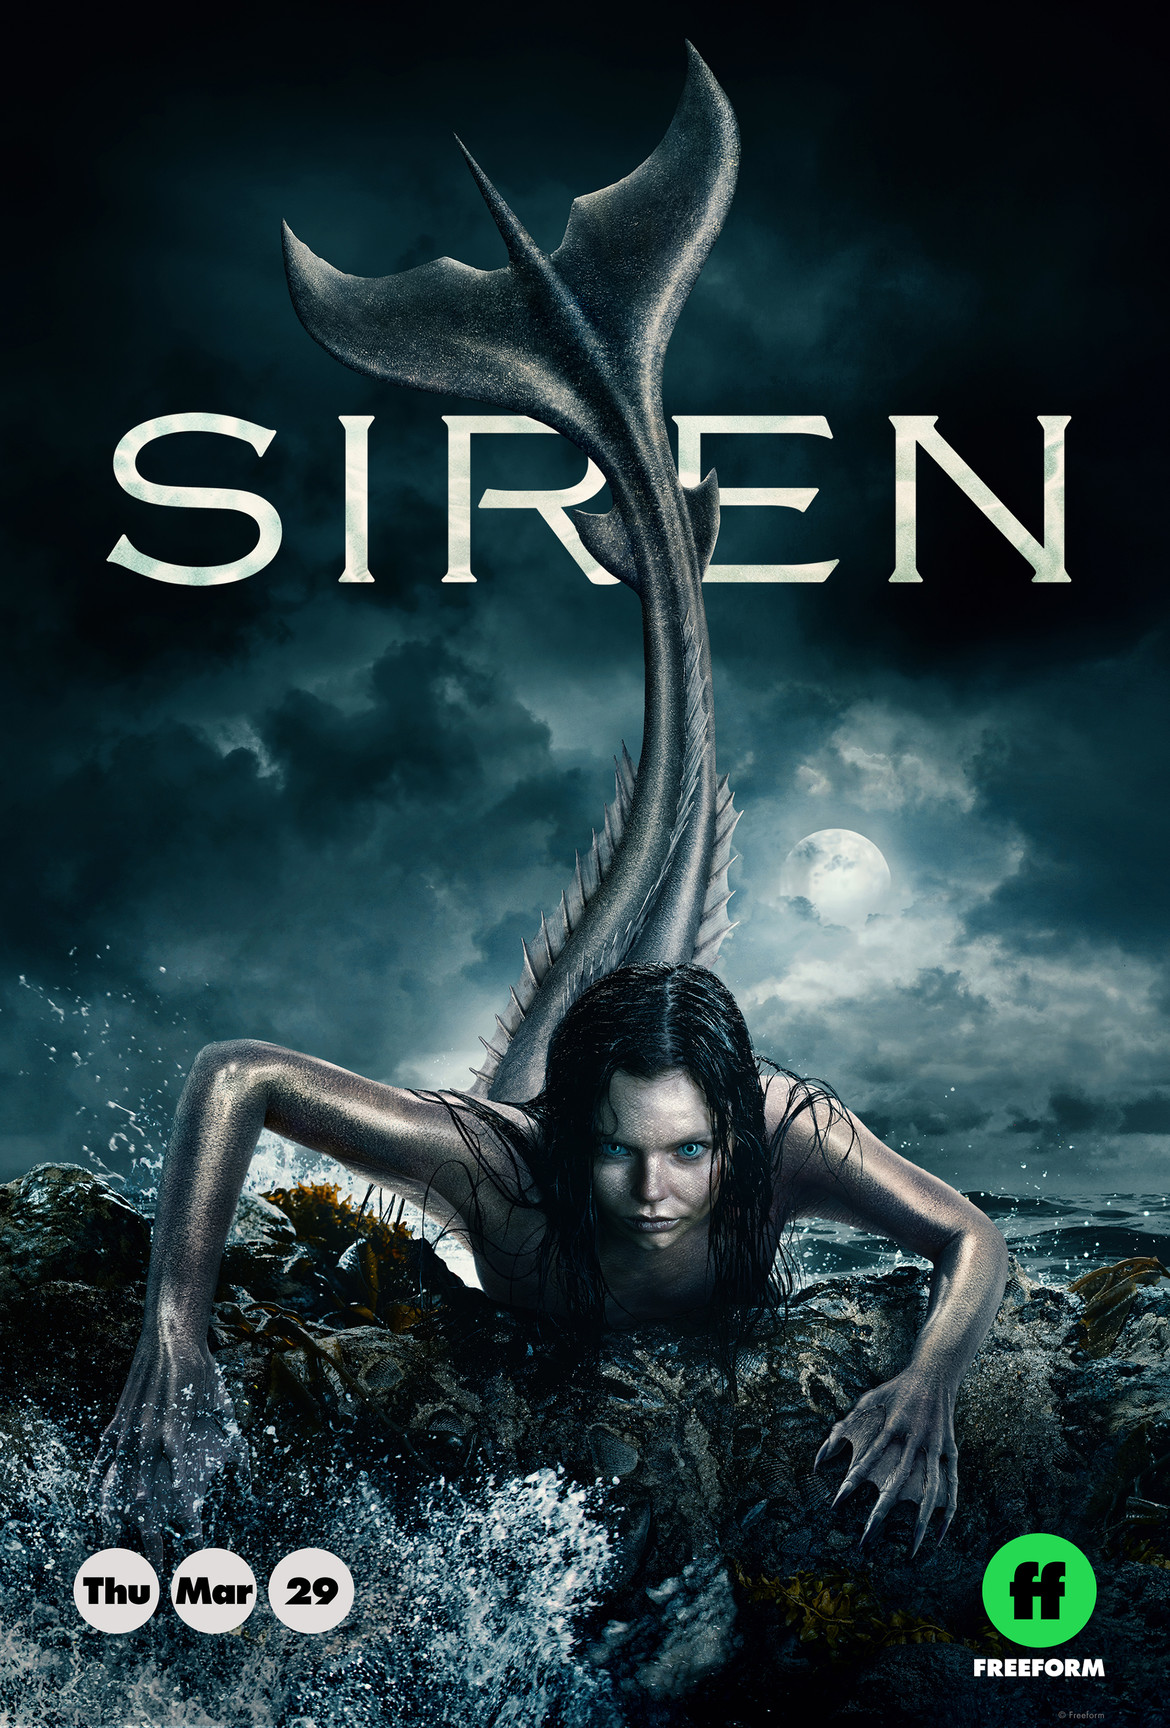 Freeform Siren key art poster